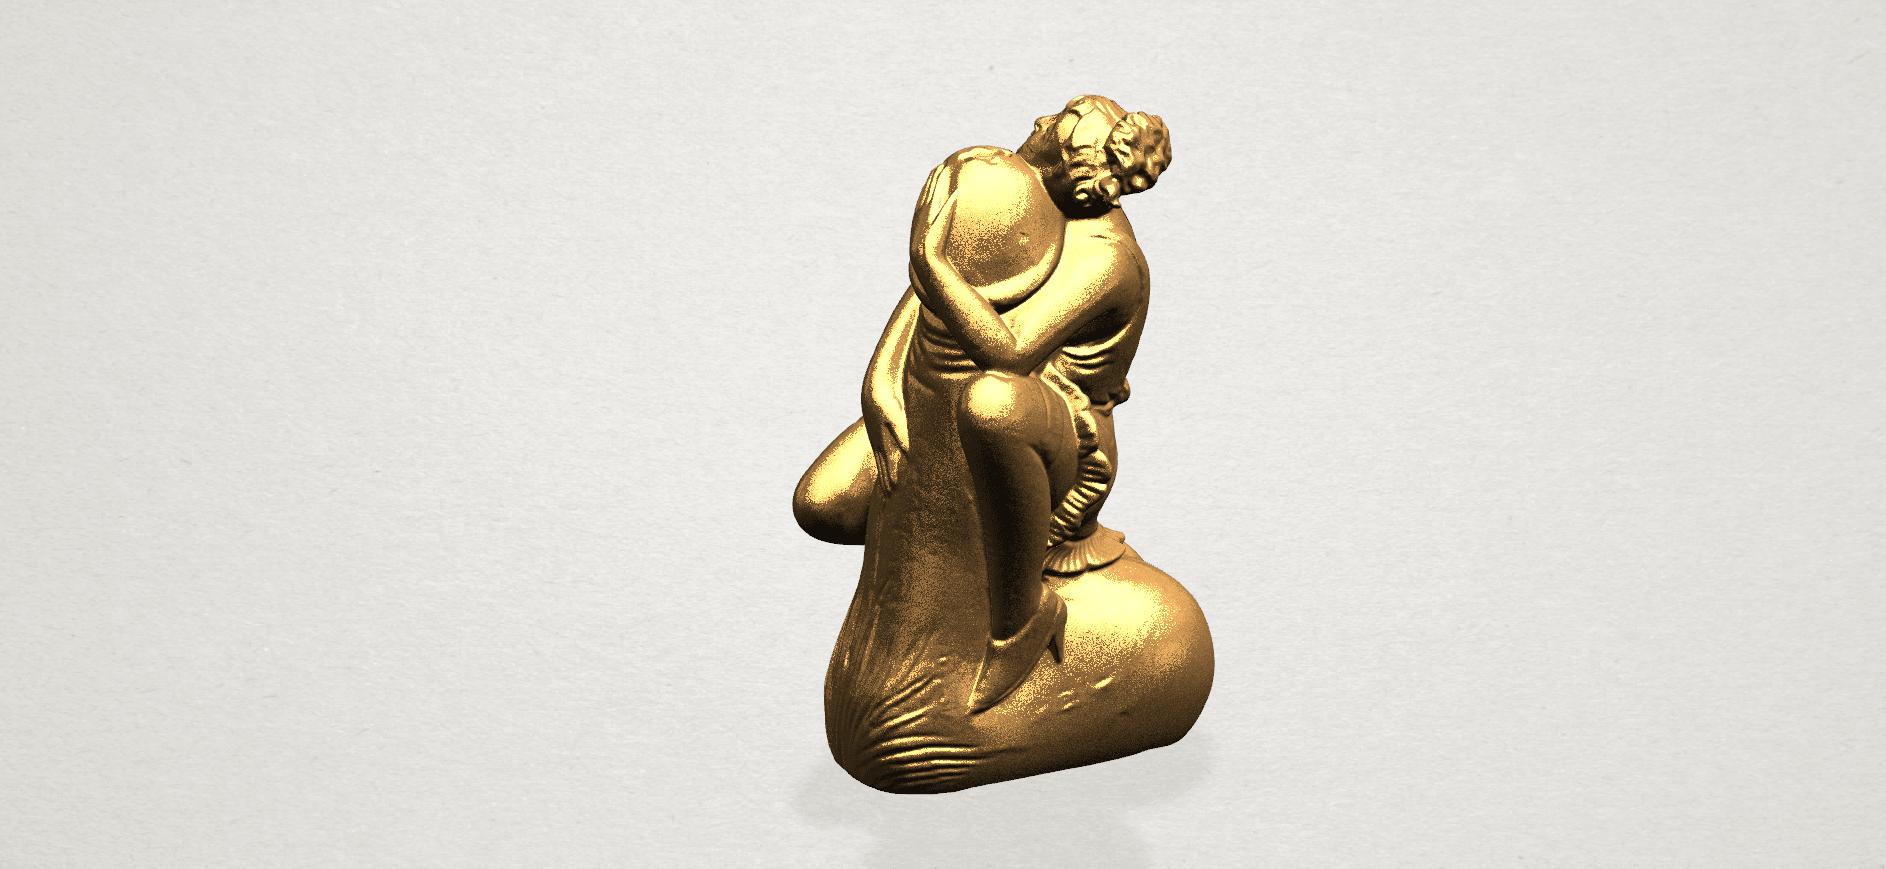 Alice hugging Dick - C01.png Download free STL file Alice hugging Dick • 3D printer design, GeorgesNikkei